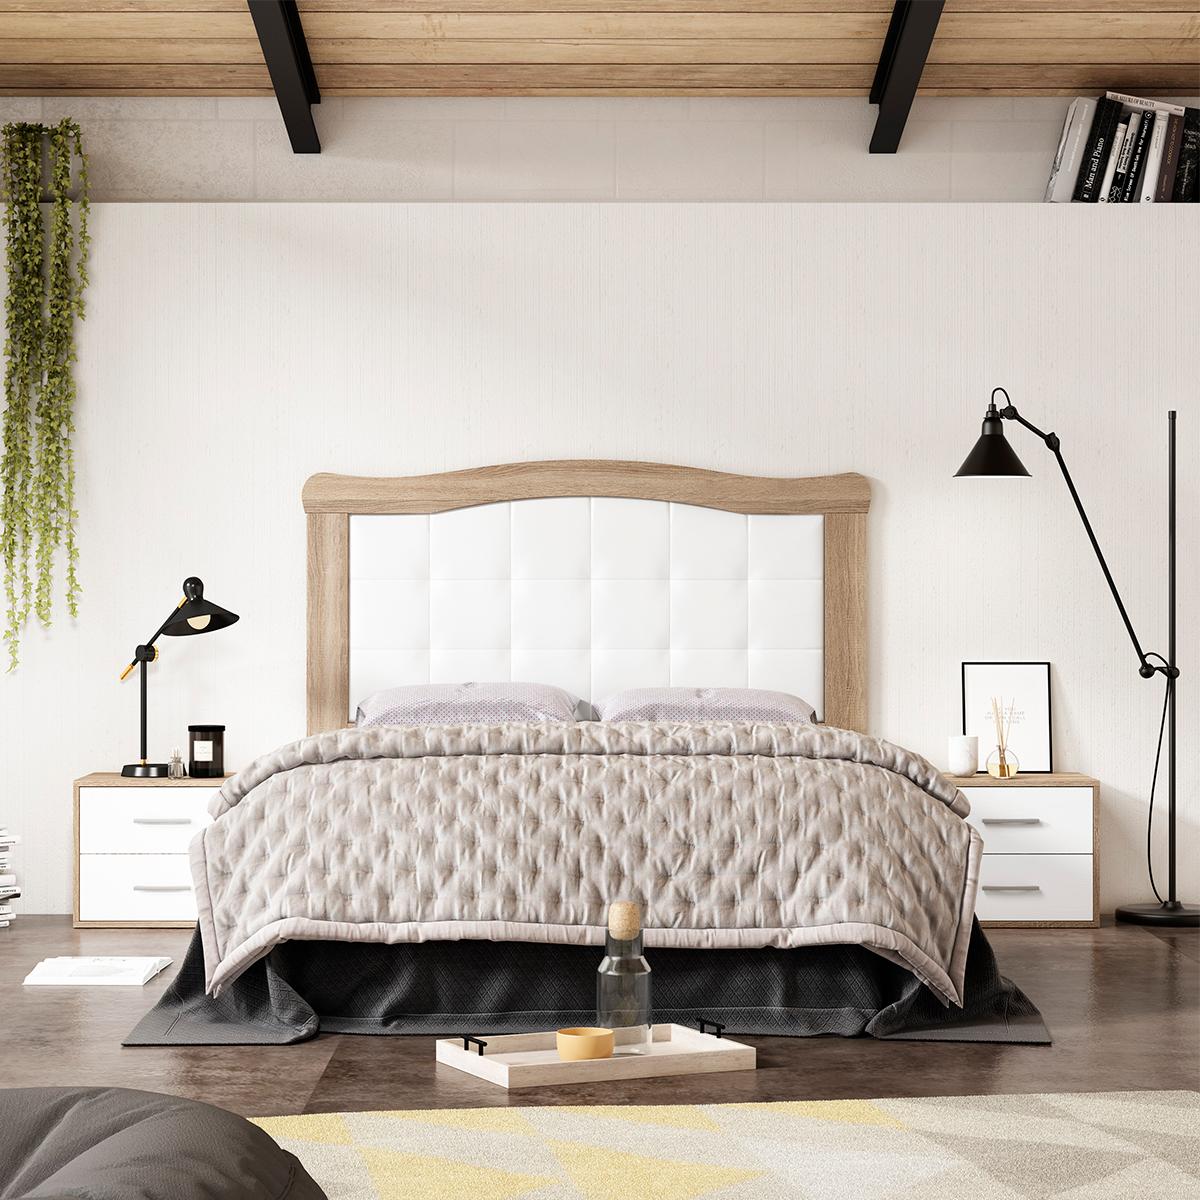 Dormitorio de matrimonio New Plus 07 cabecero y 2 mesitas